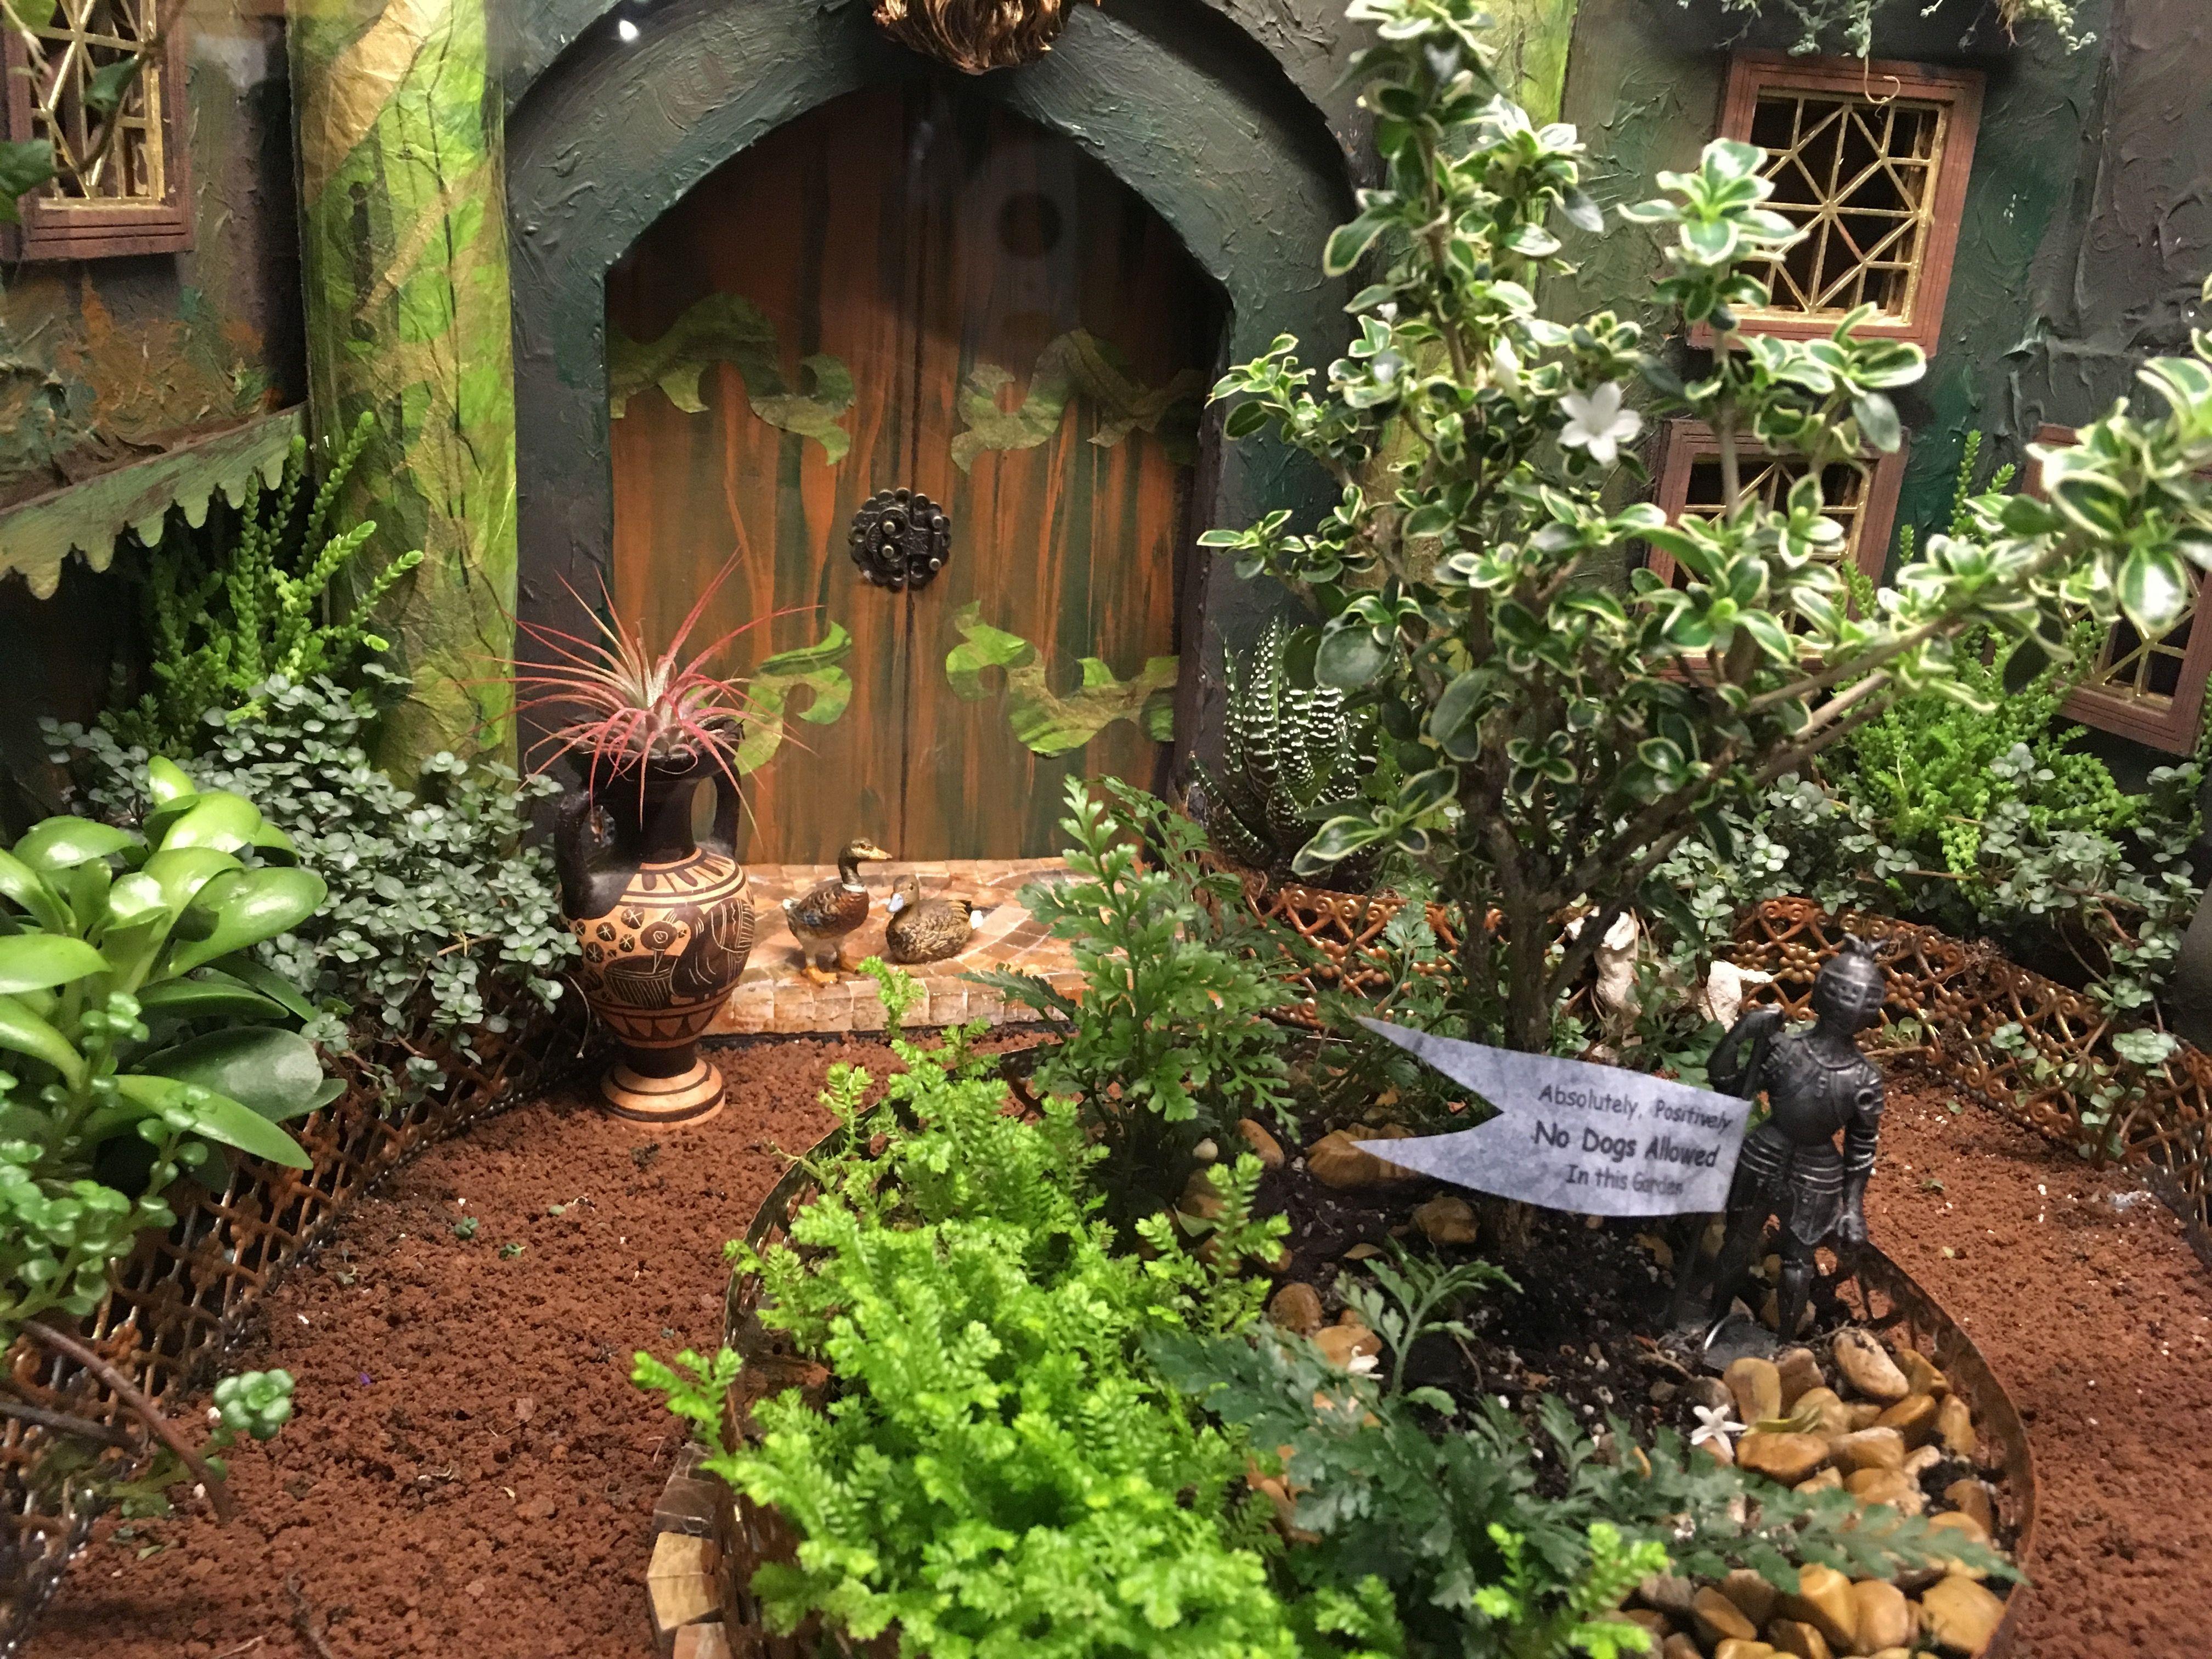 Miniature exhibit, Philadelphia flower show 2019 Flower